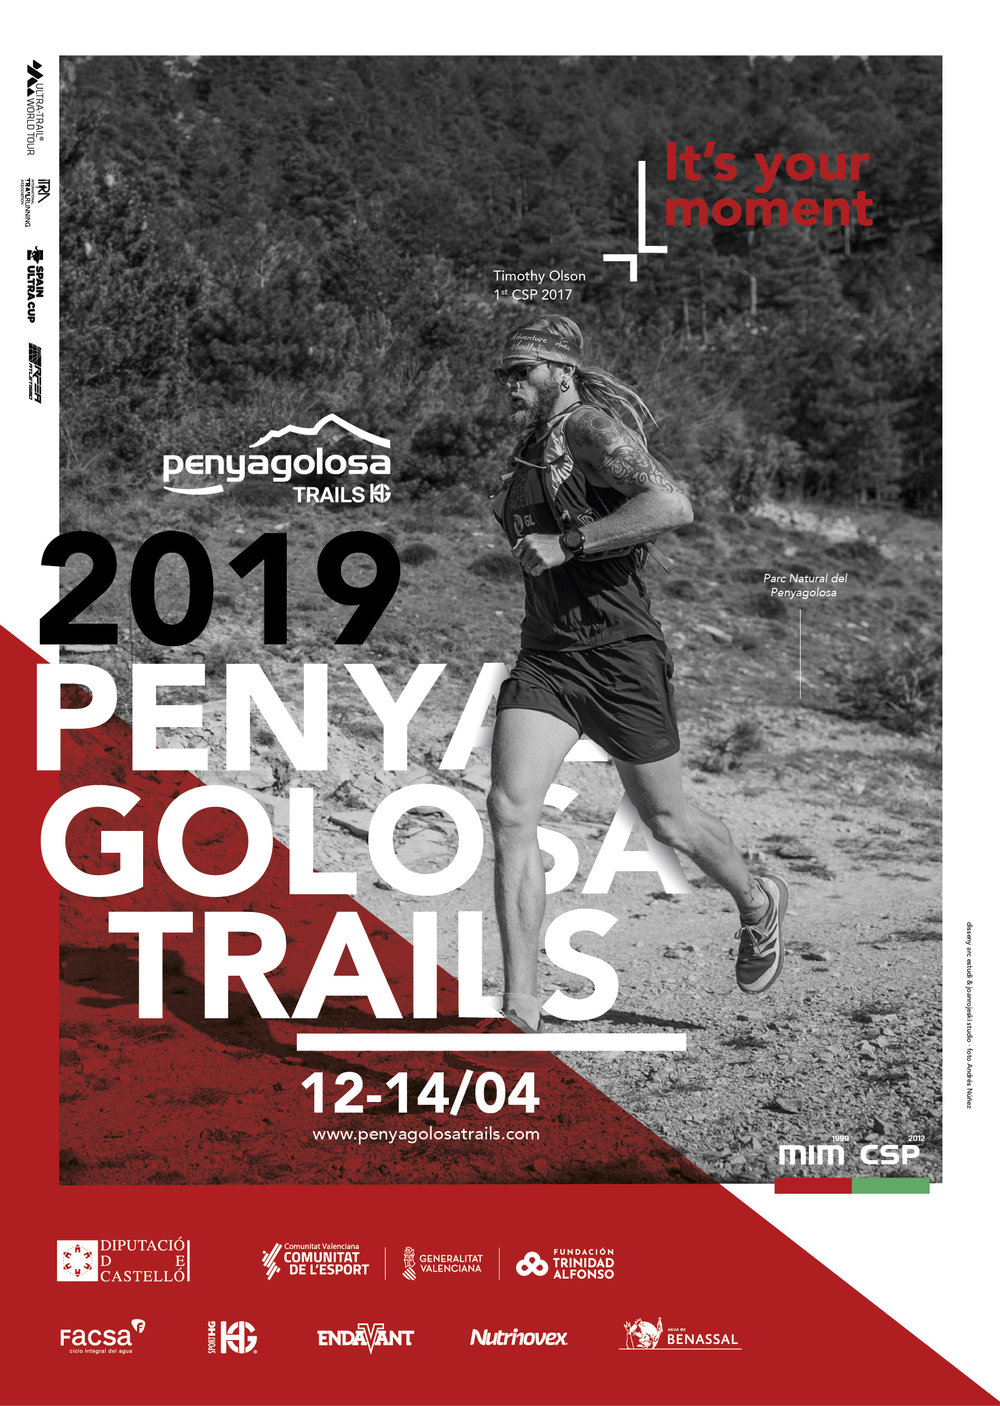 Affiche-Penyagolosa-Trails-2019